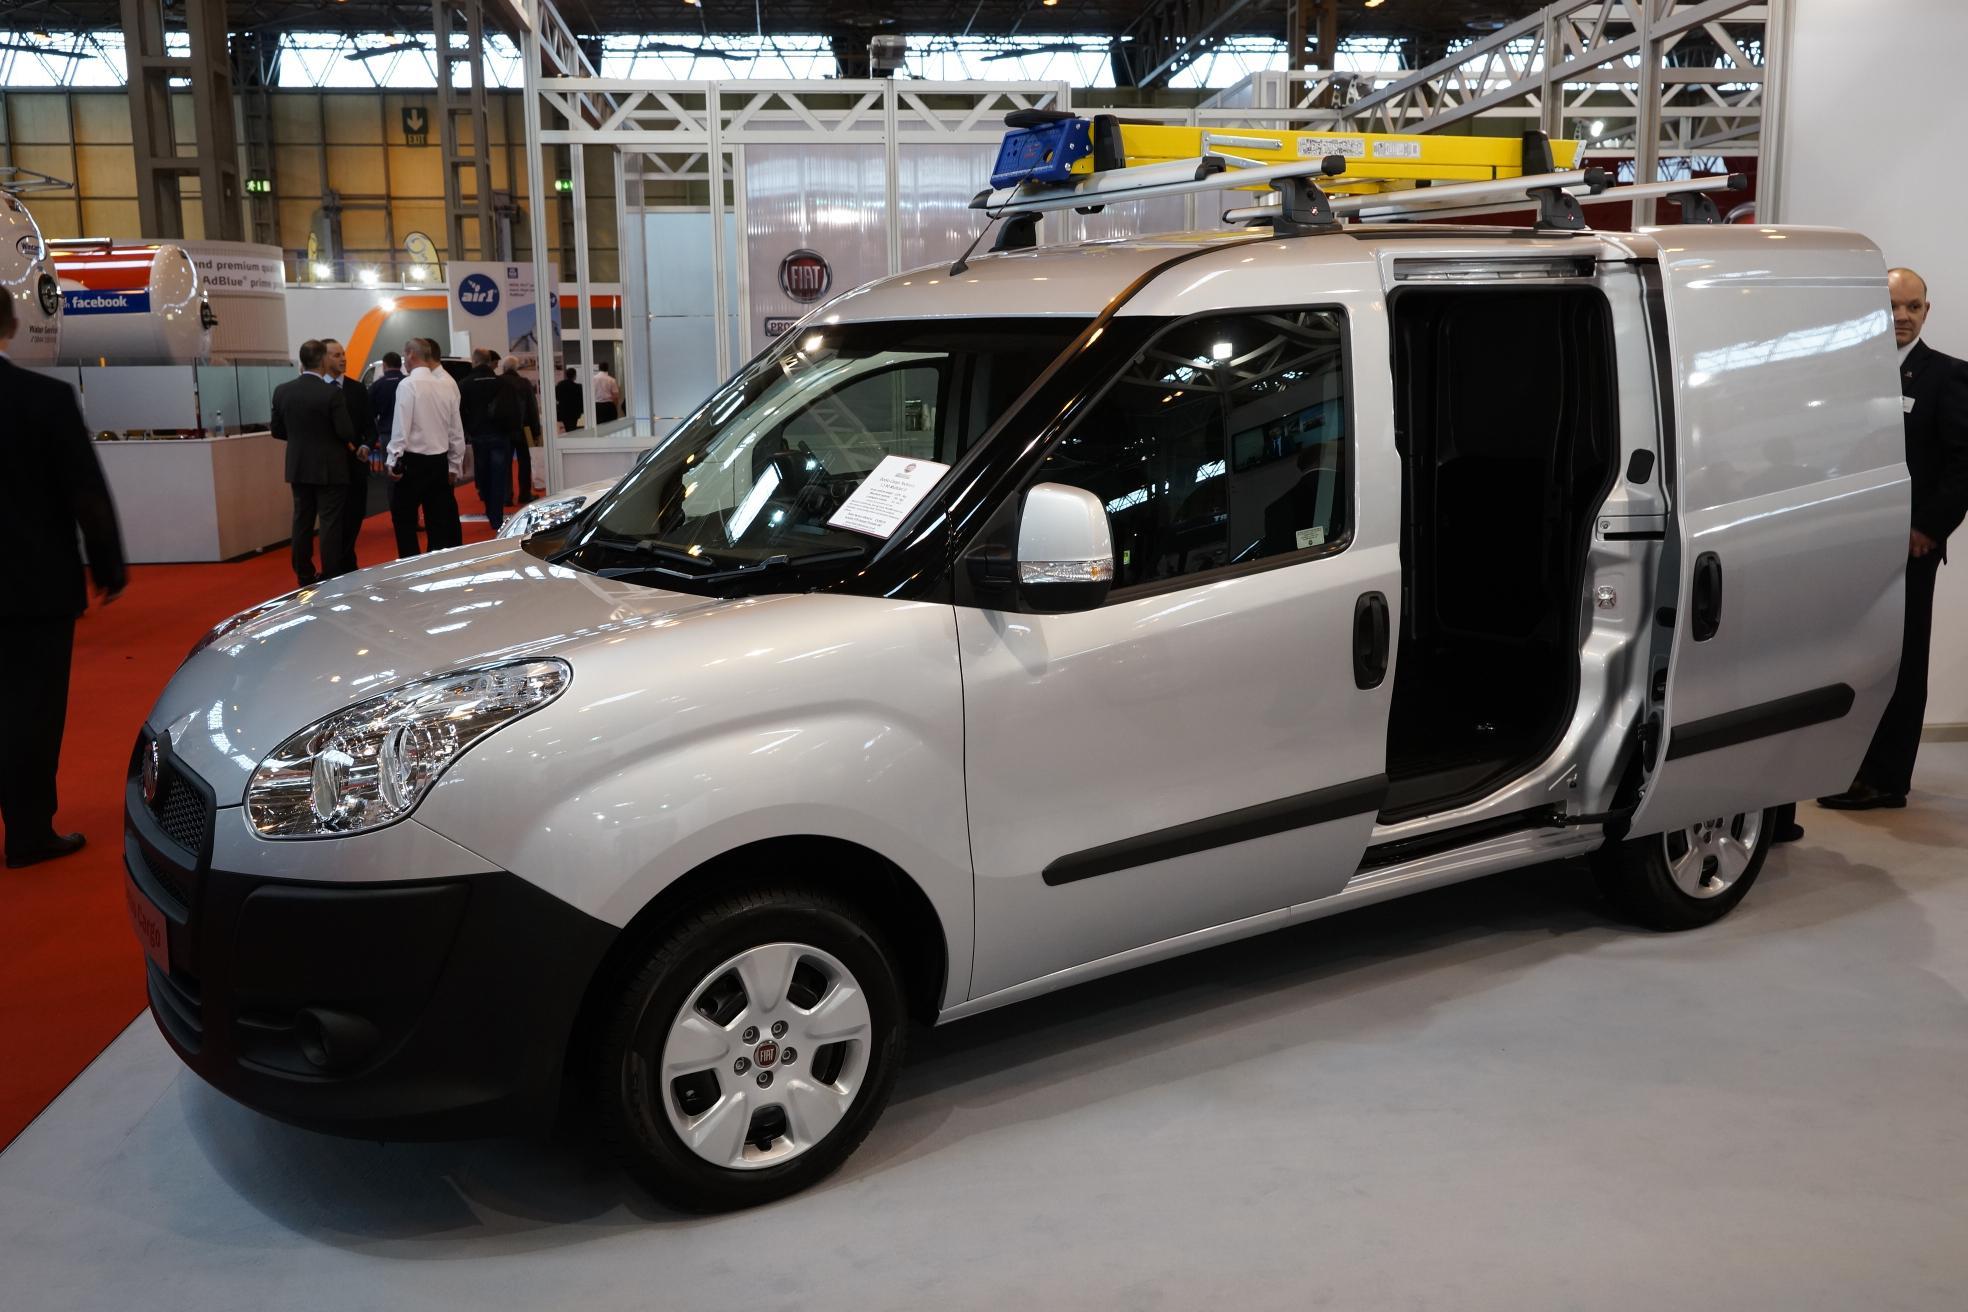 Fiat Scudo - CommercialVehicle.com